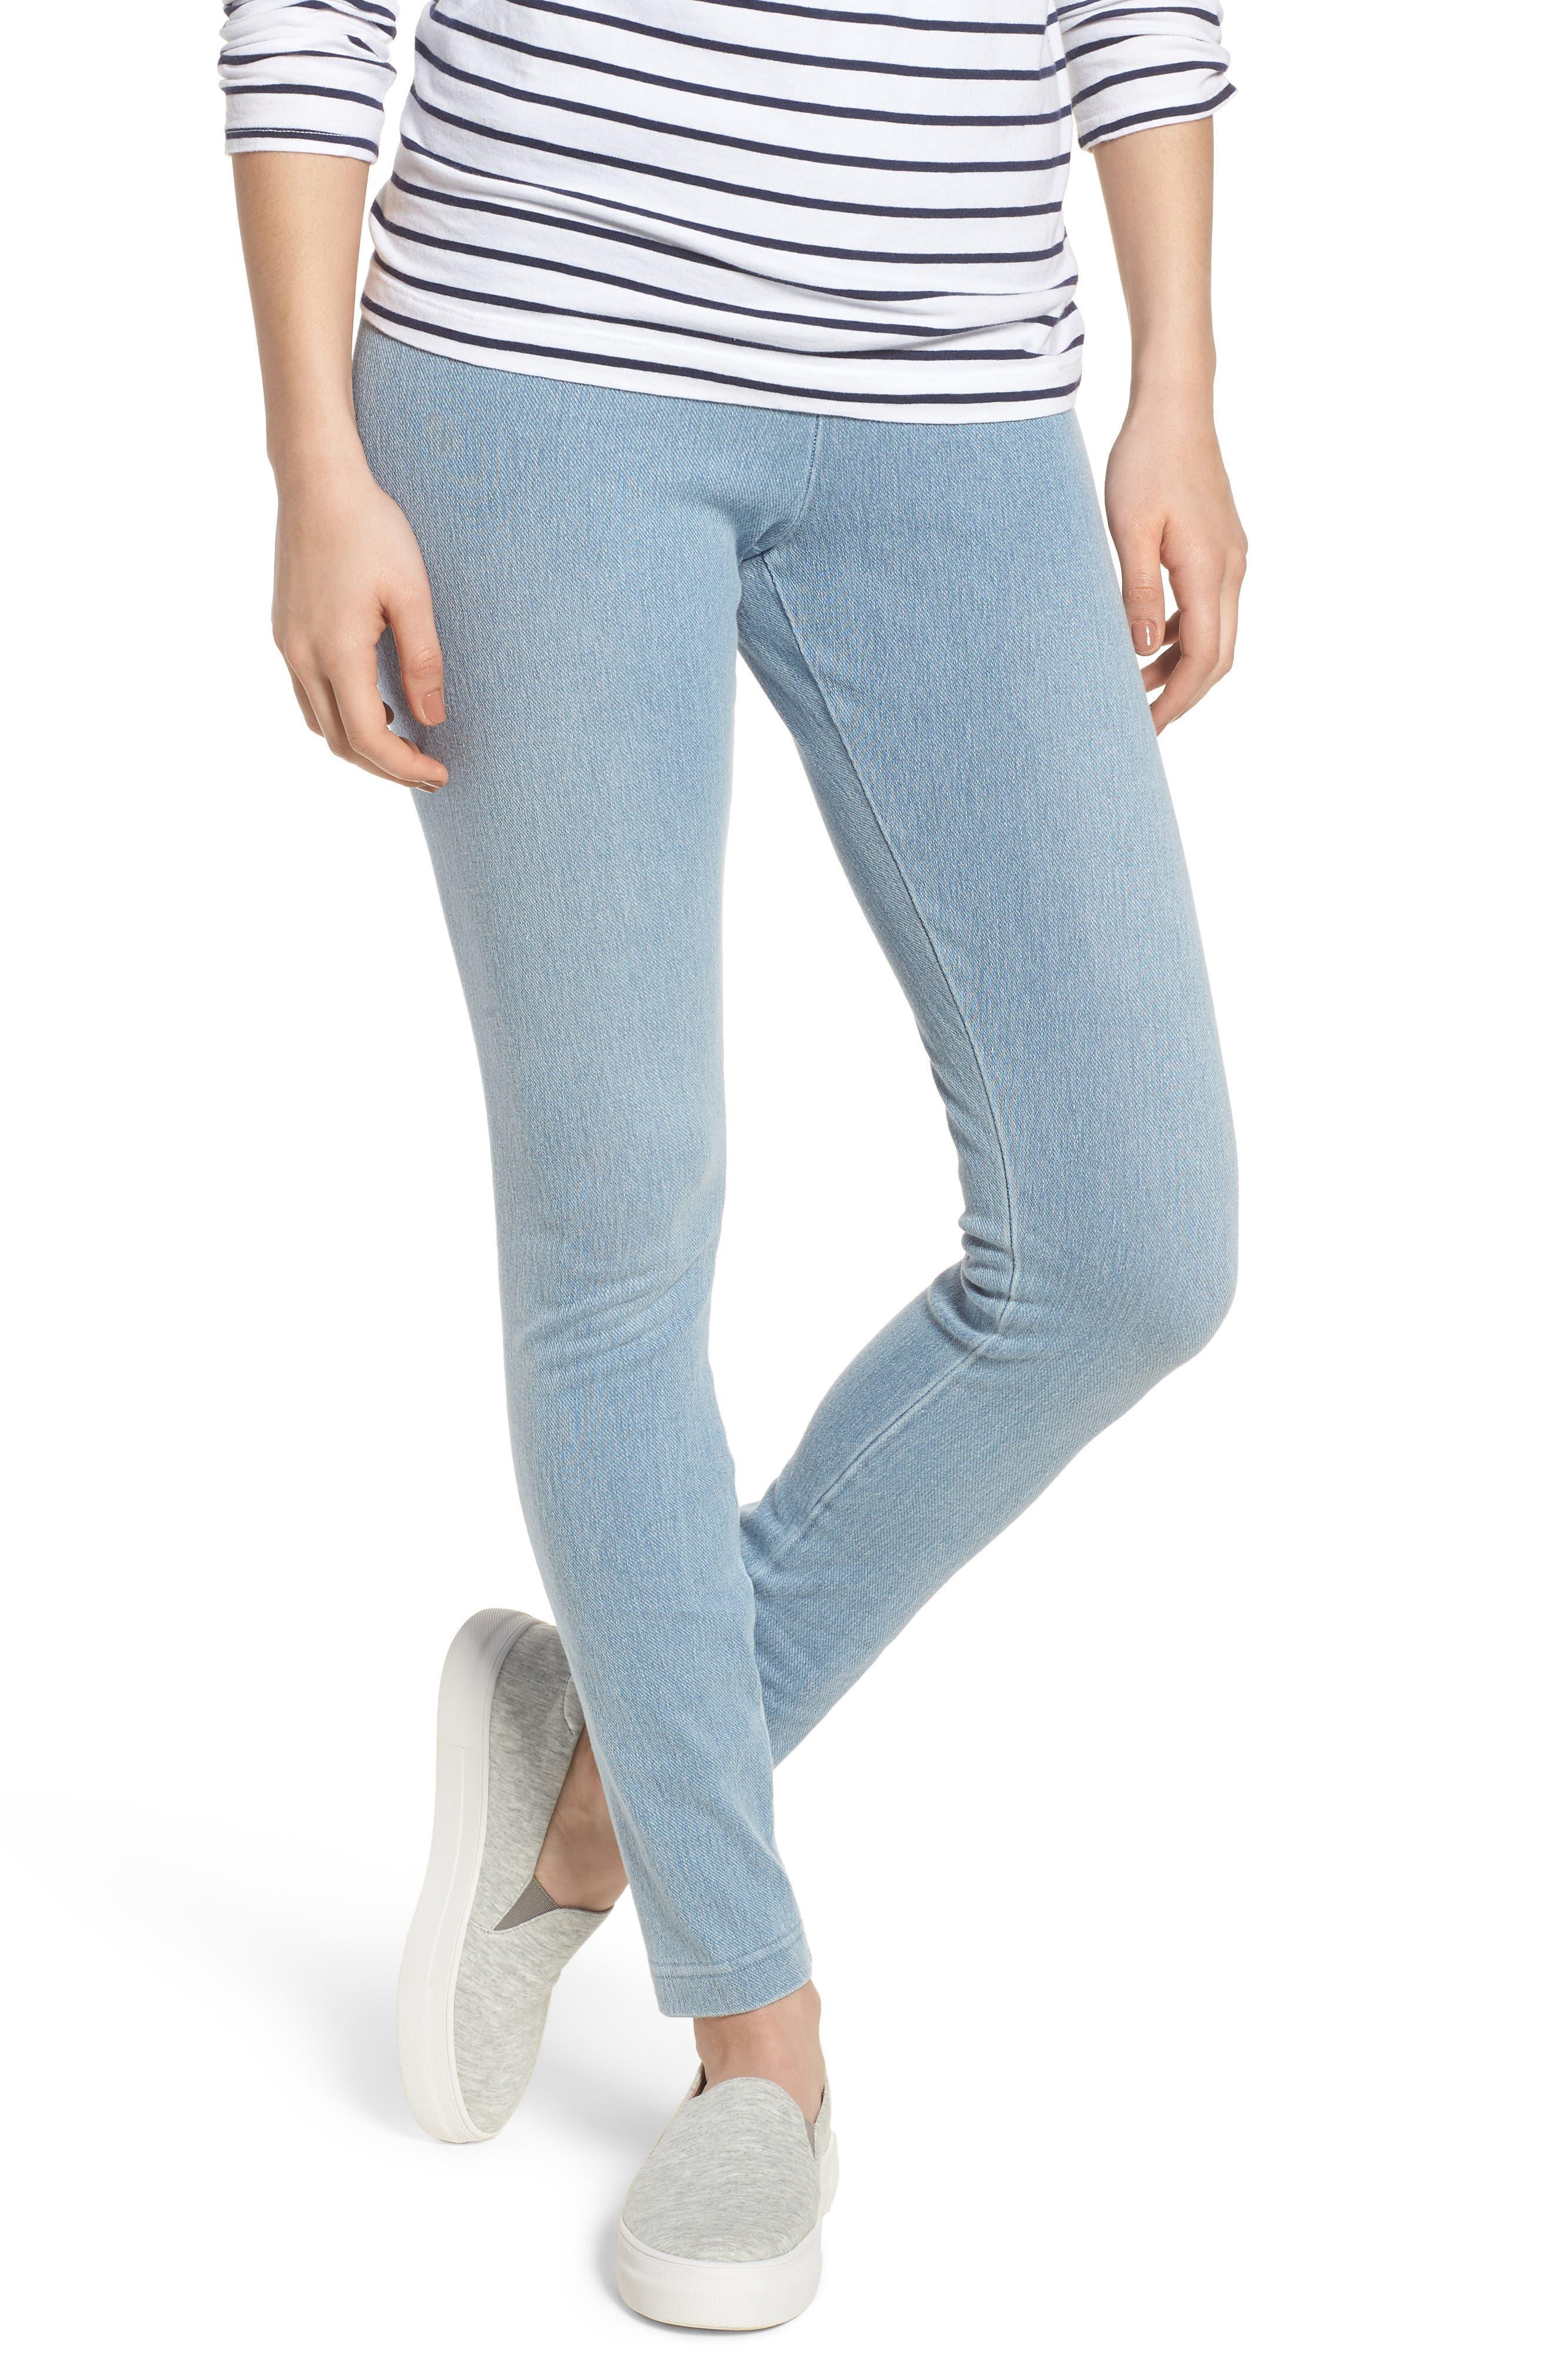 High Waist Denim Leggings,                         Main,                         color, Cashmere Blue